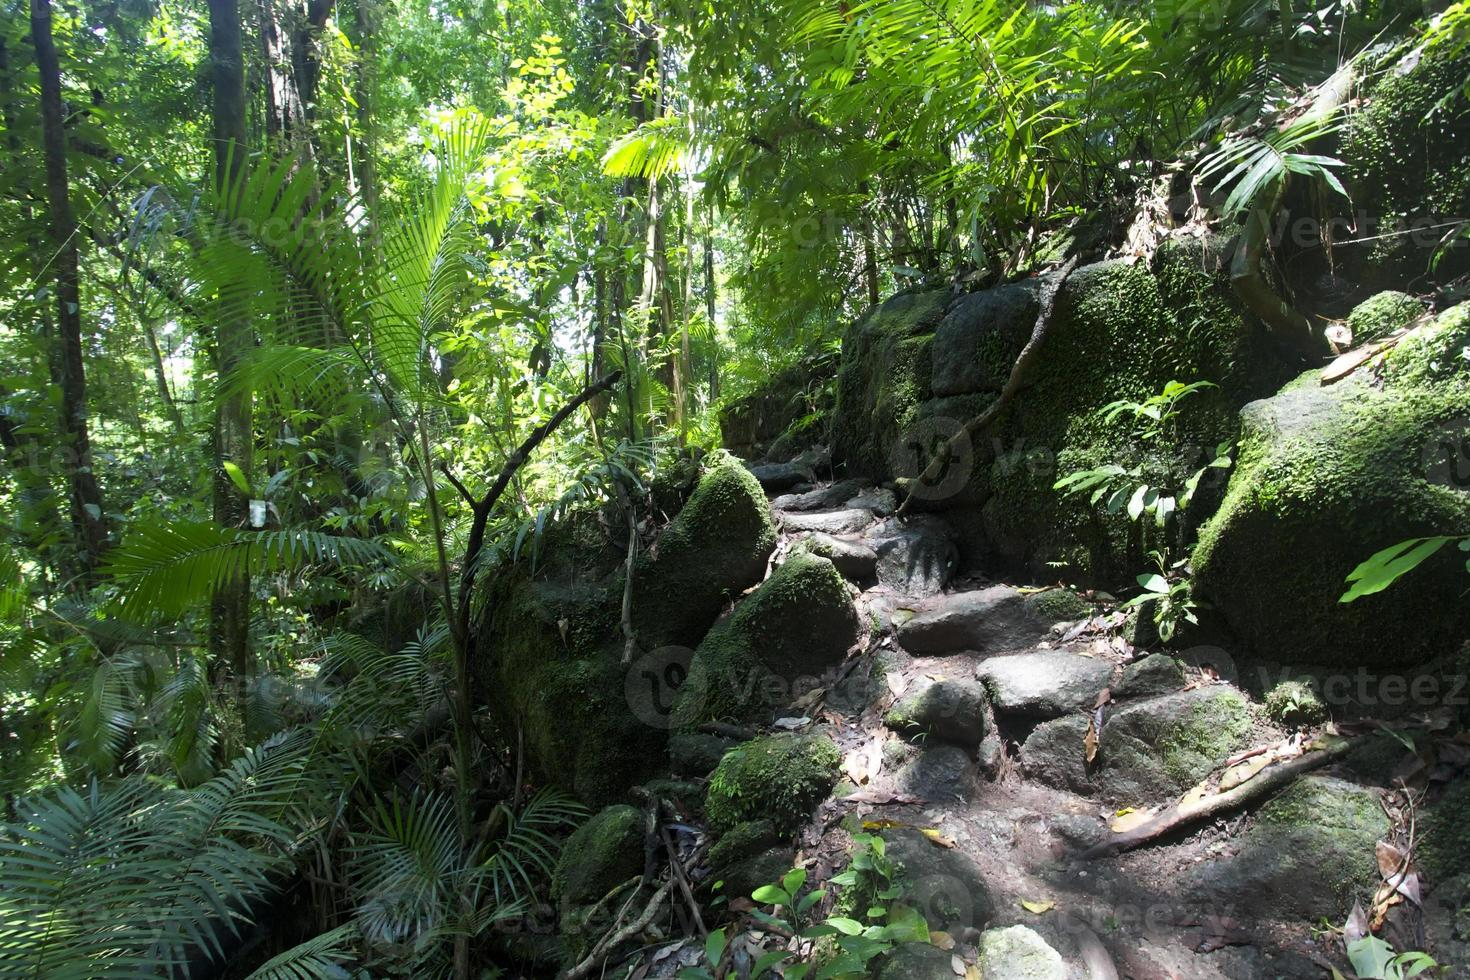 Rainforest at Mossman Gorge Daintree National Park photo